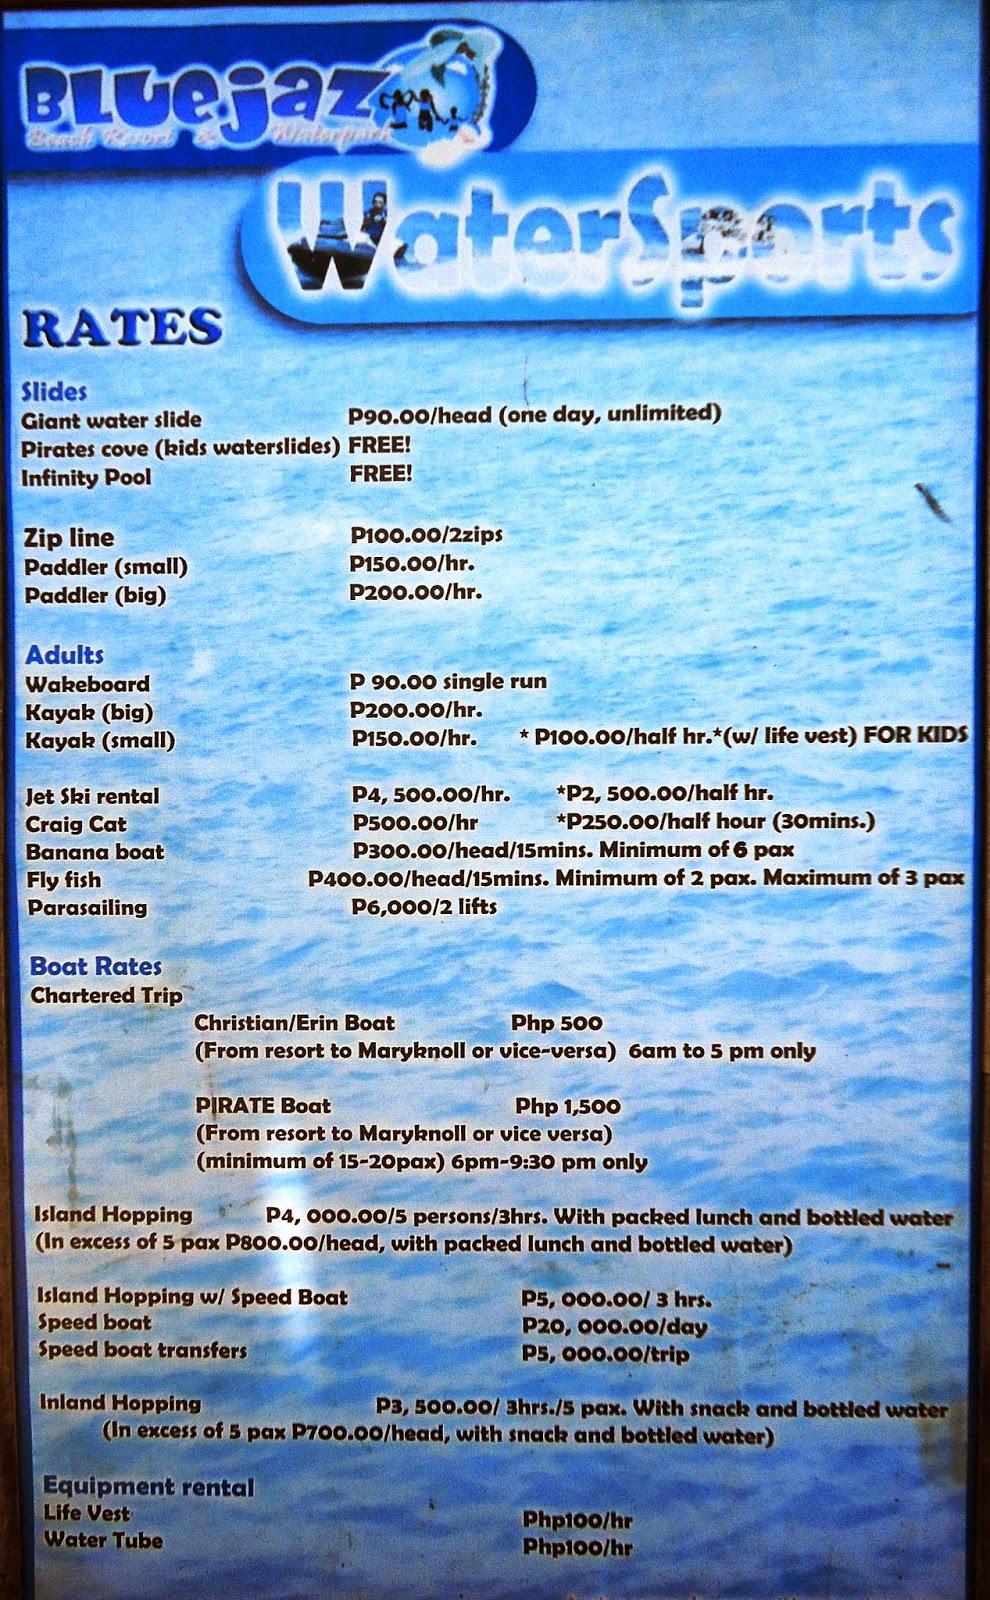 Blue Jazz Resort Room Rates